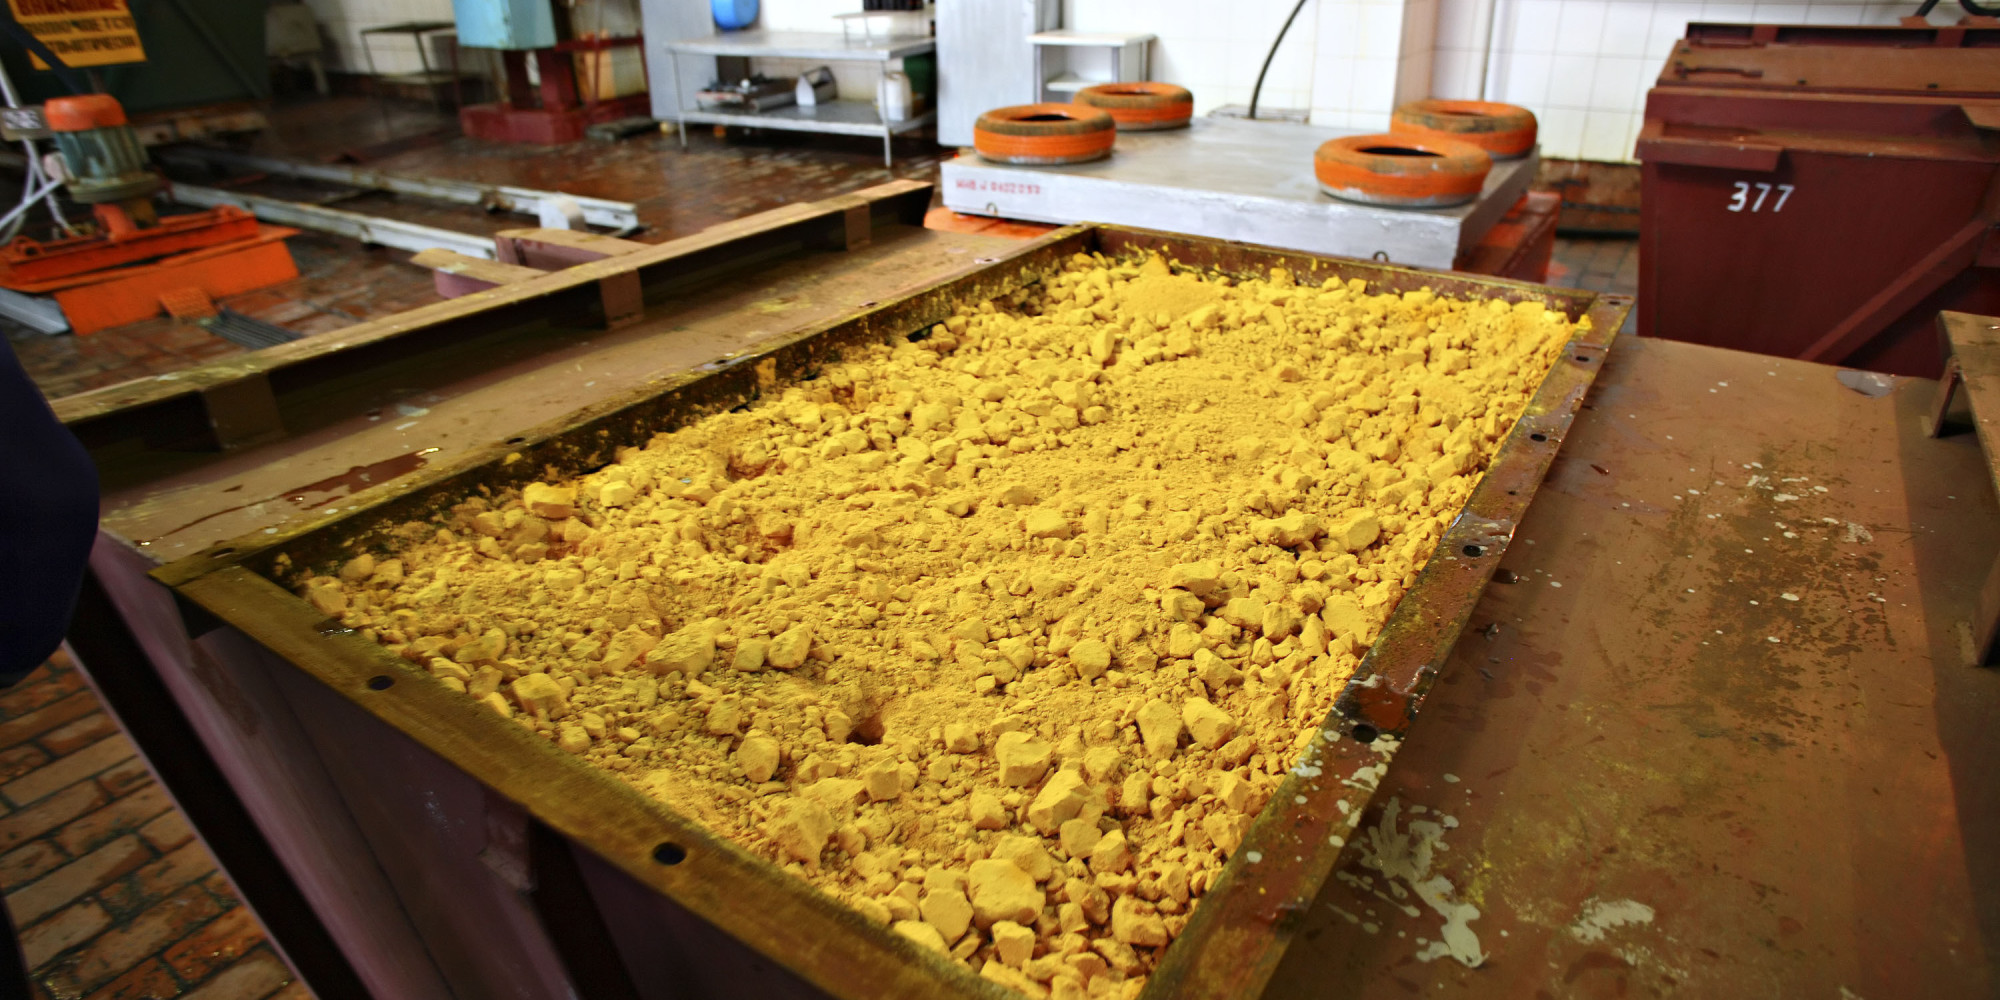 Saskatchewan Uranium Spill: Here's What You Need To Know